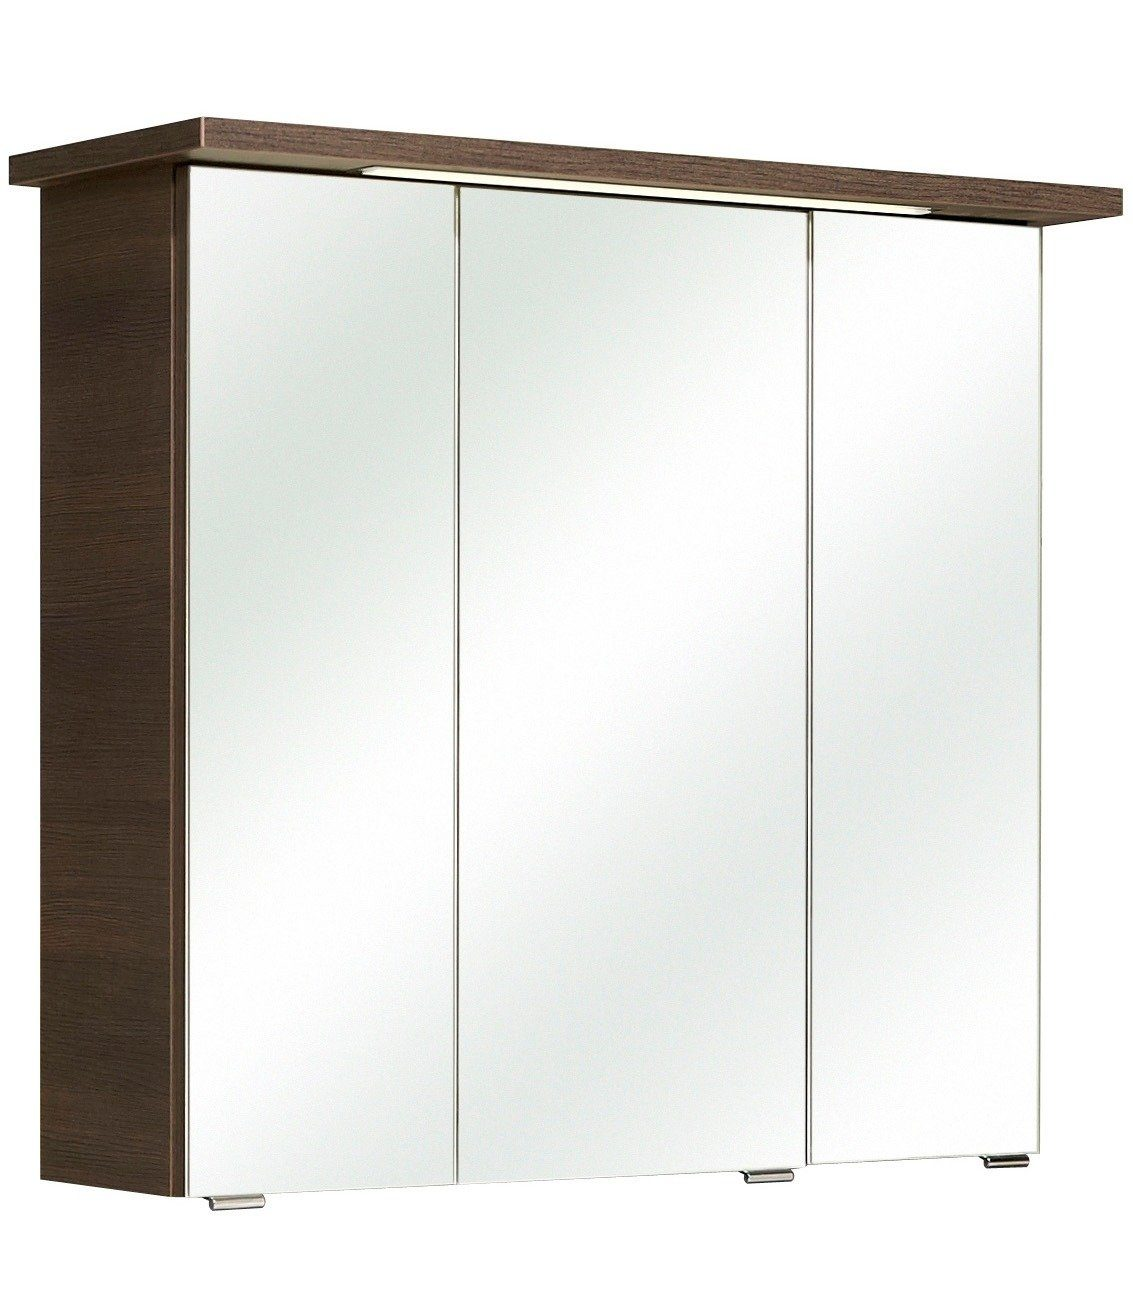 Pelipal Spiegelschrank »Mara« 75 cm